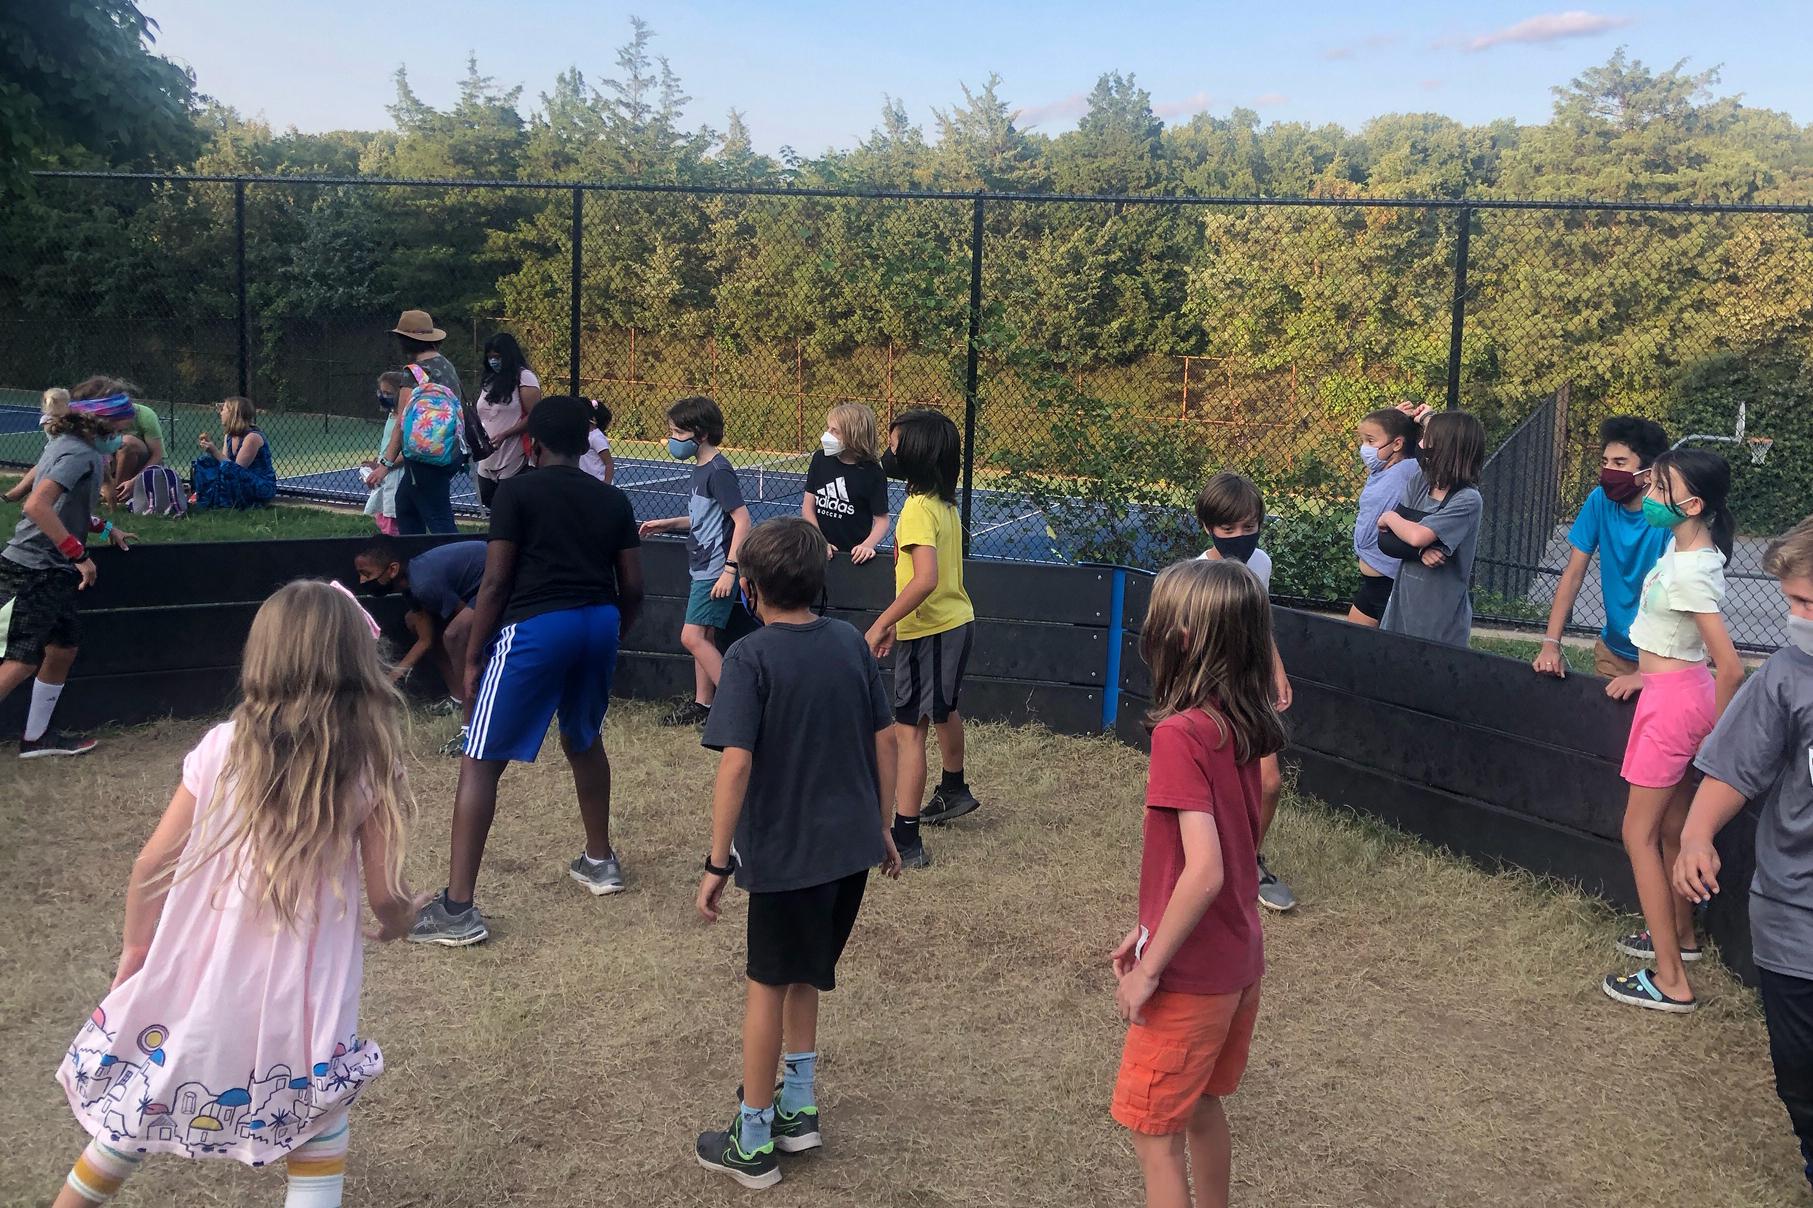 Students enjoy the new Gaga ball pit